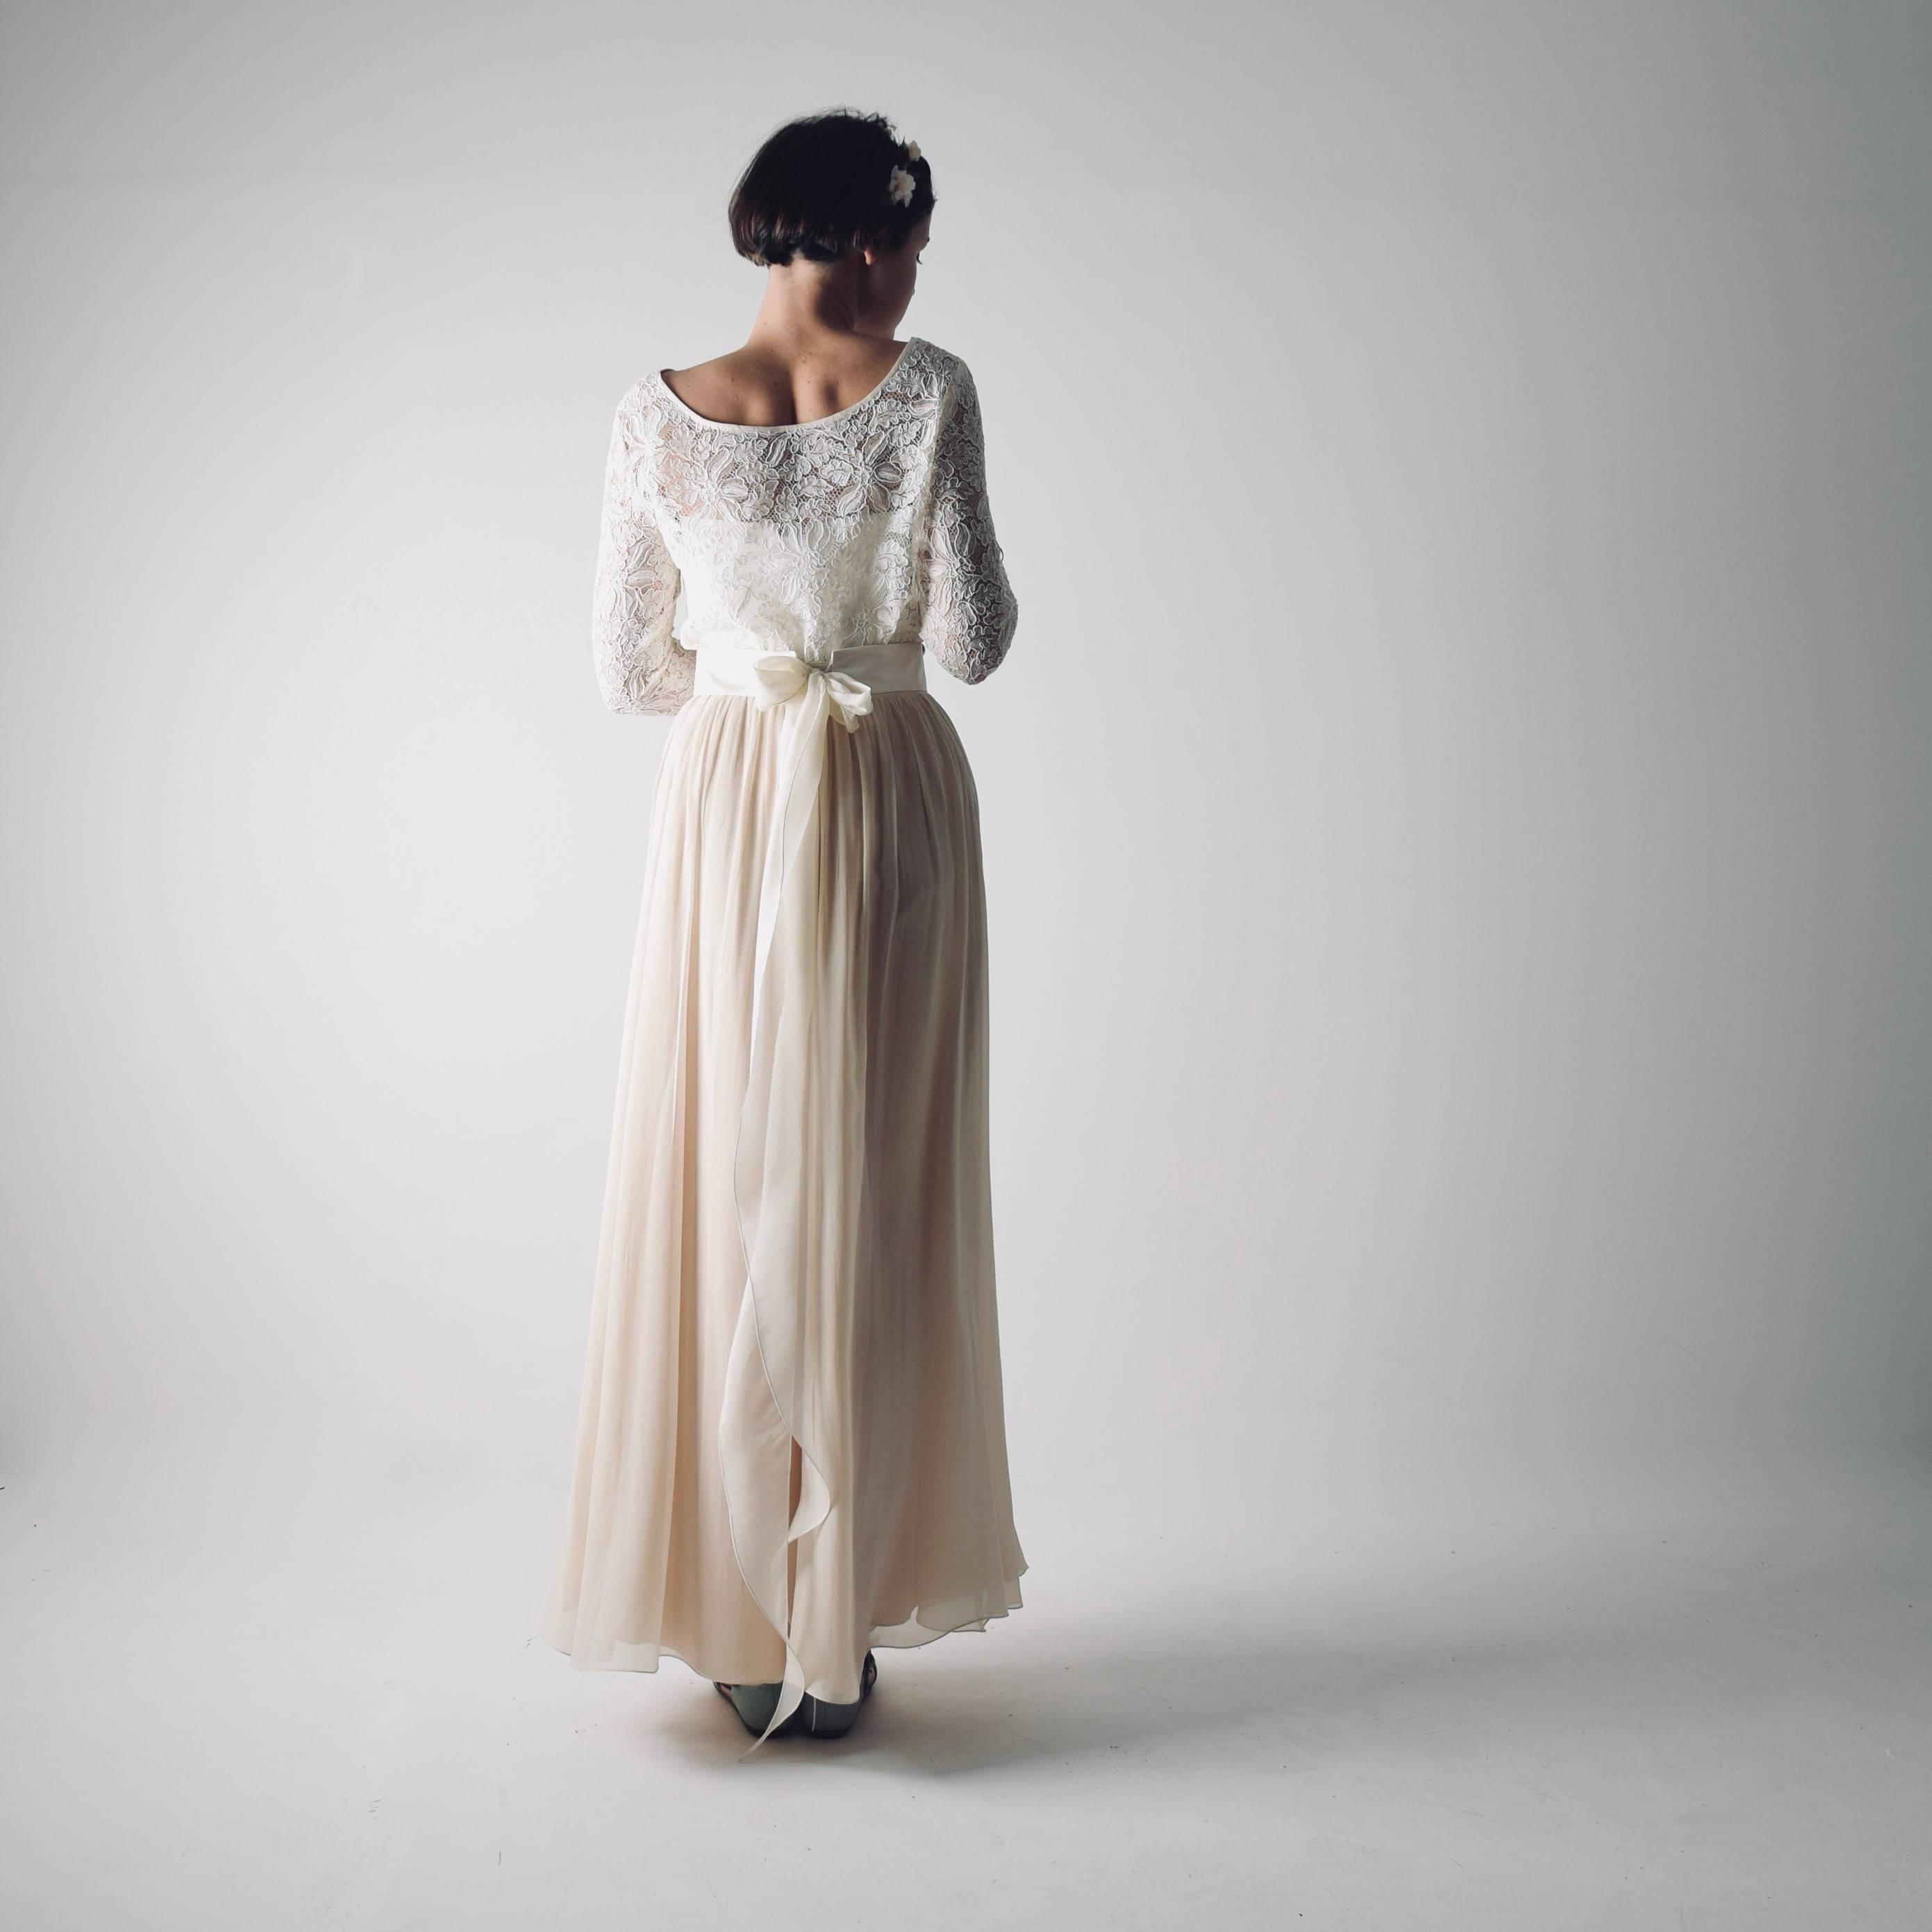 Simple Low Key Wedding Dresses: Long Sleeve Modest Wedding Dress